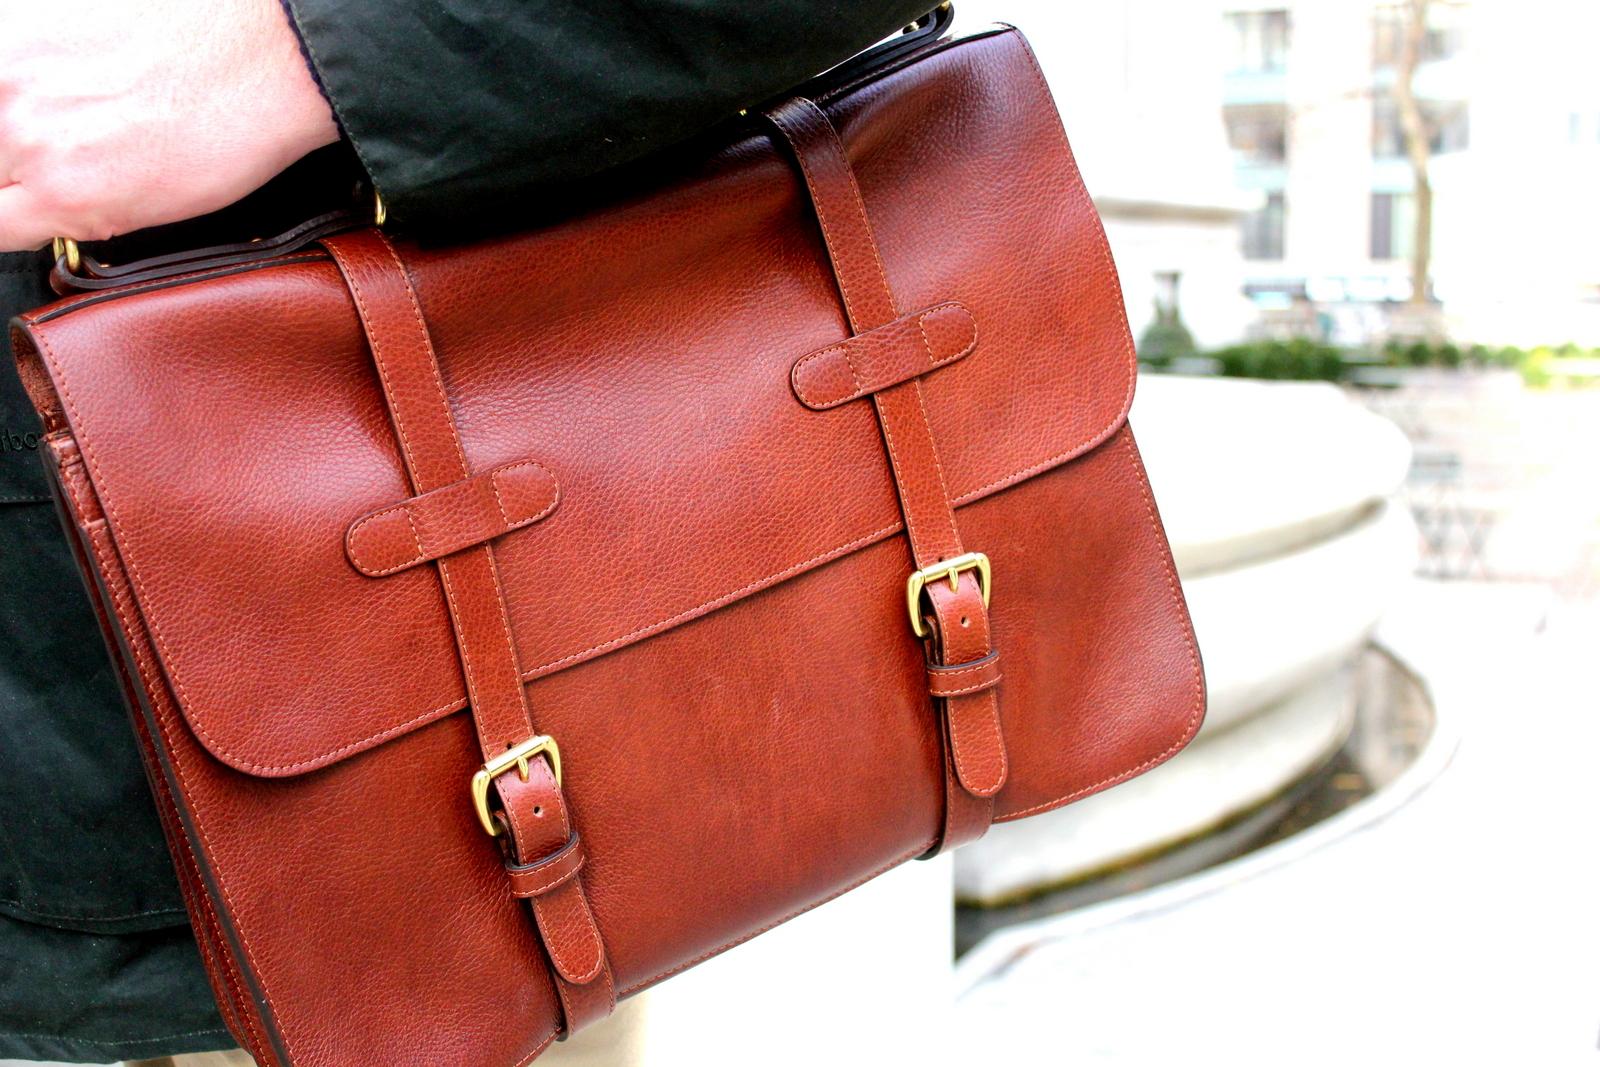 lotuff briefcase photo - 1